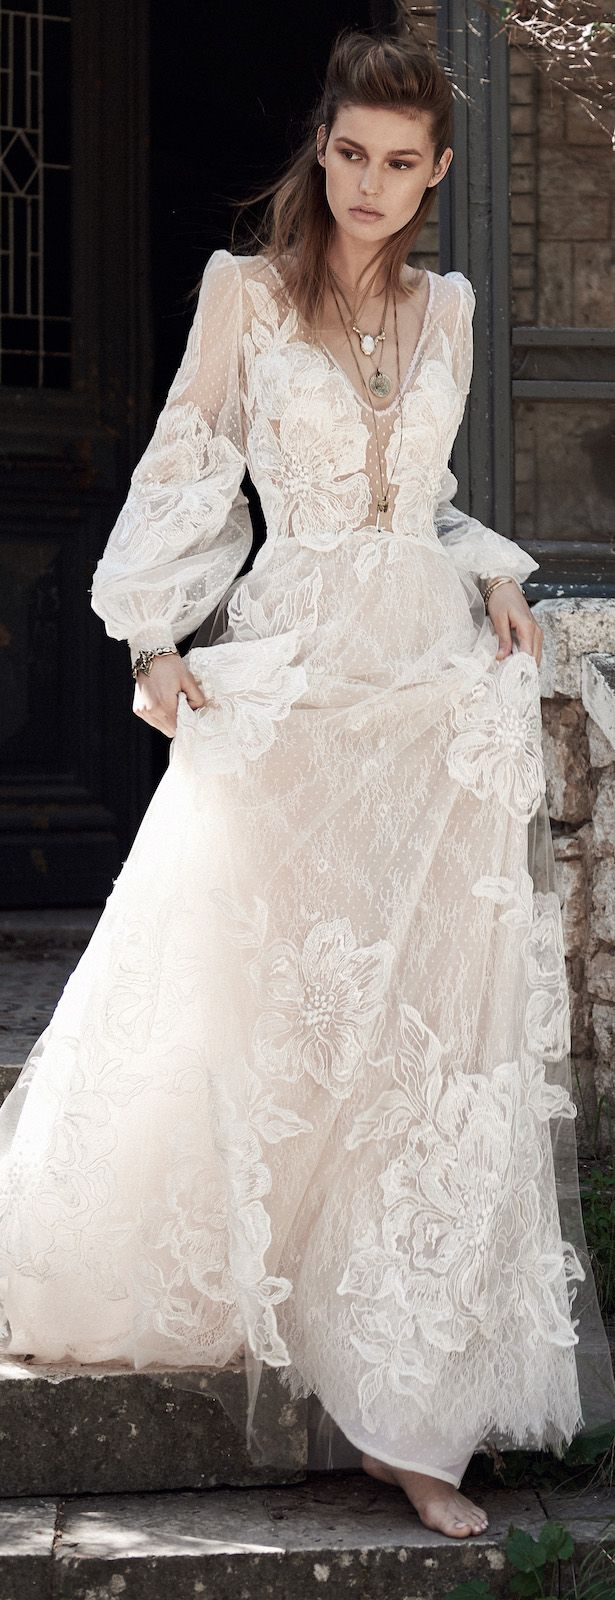 Bohemian Wedding Dress by Costarellos Spring Bridal Collection